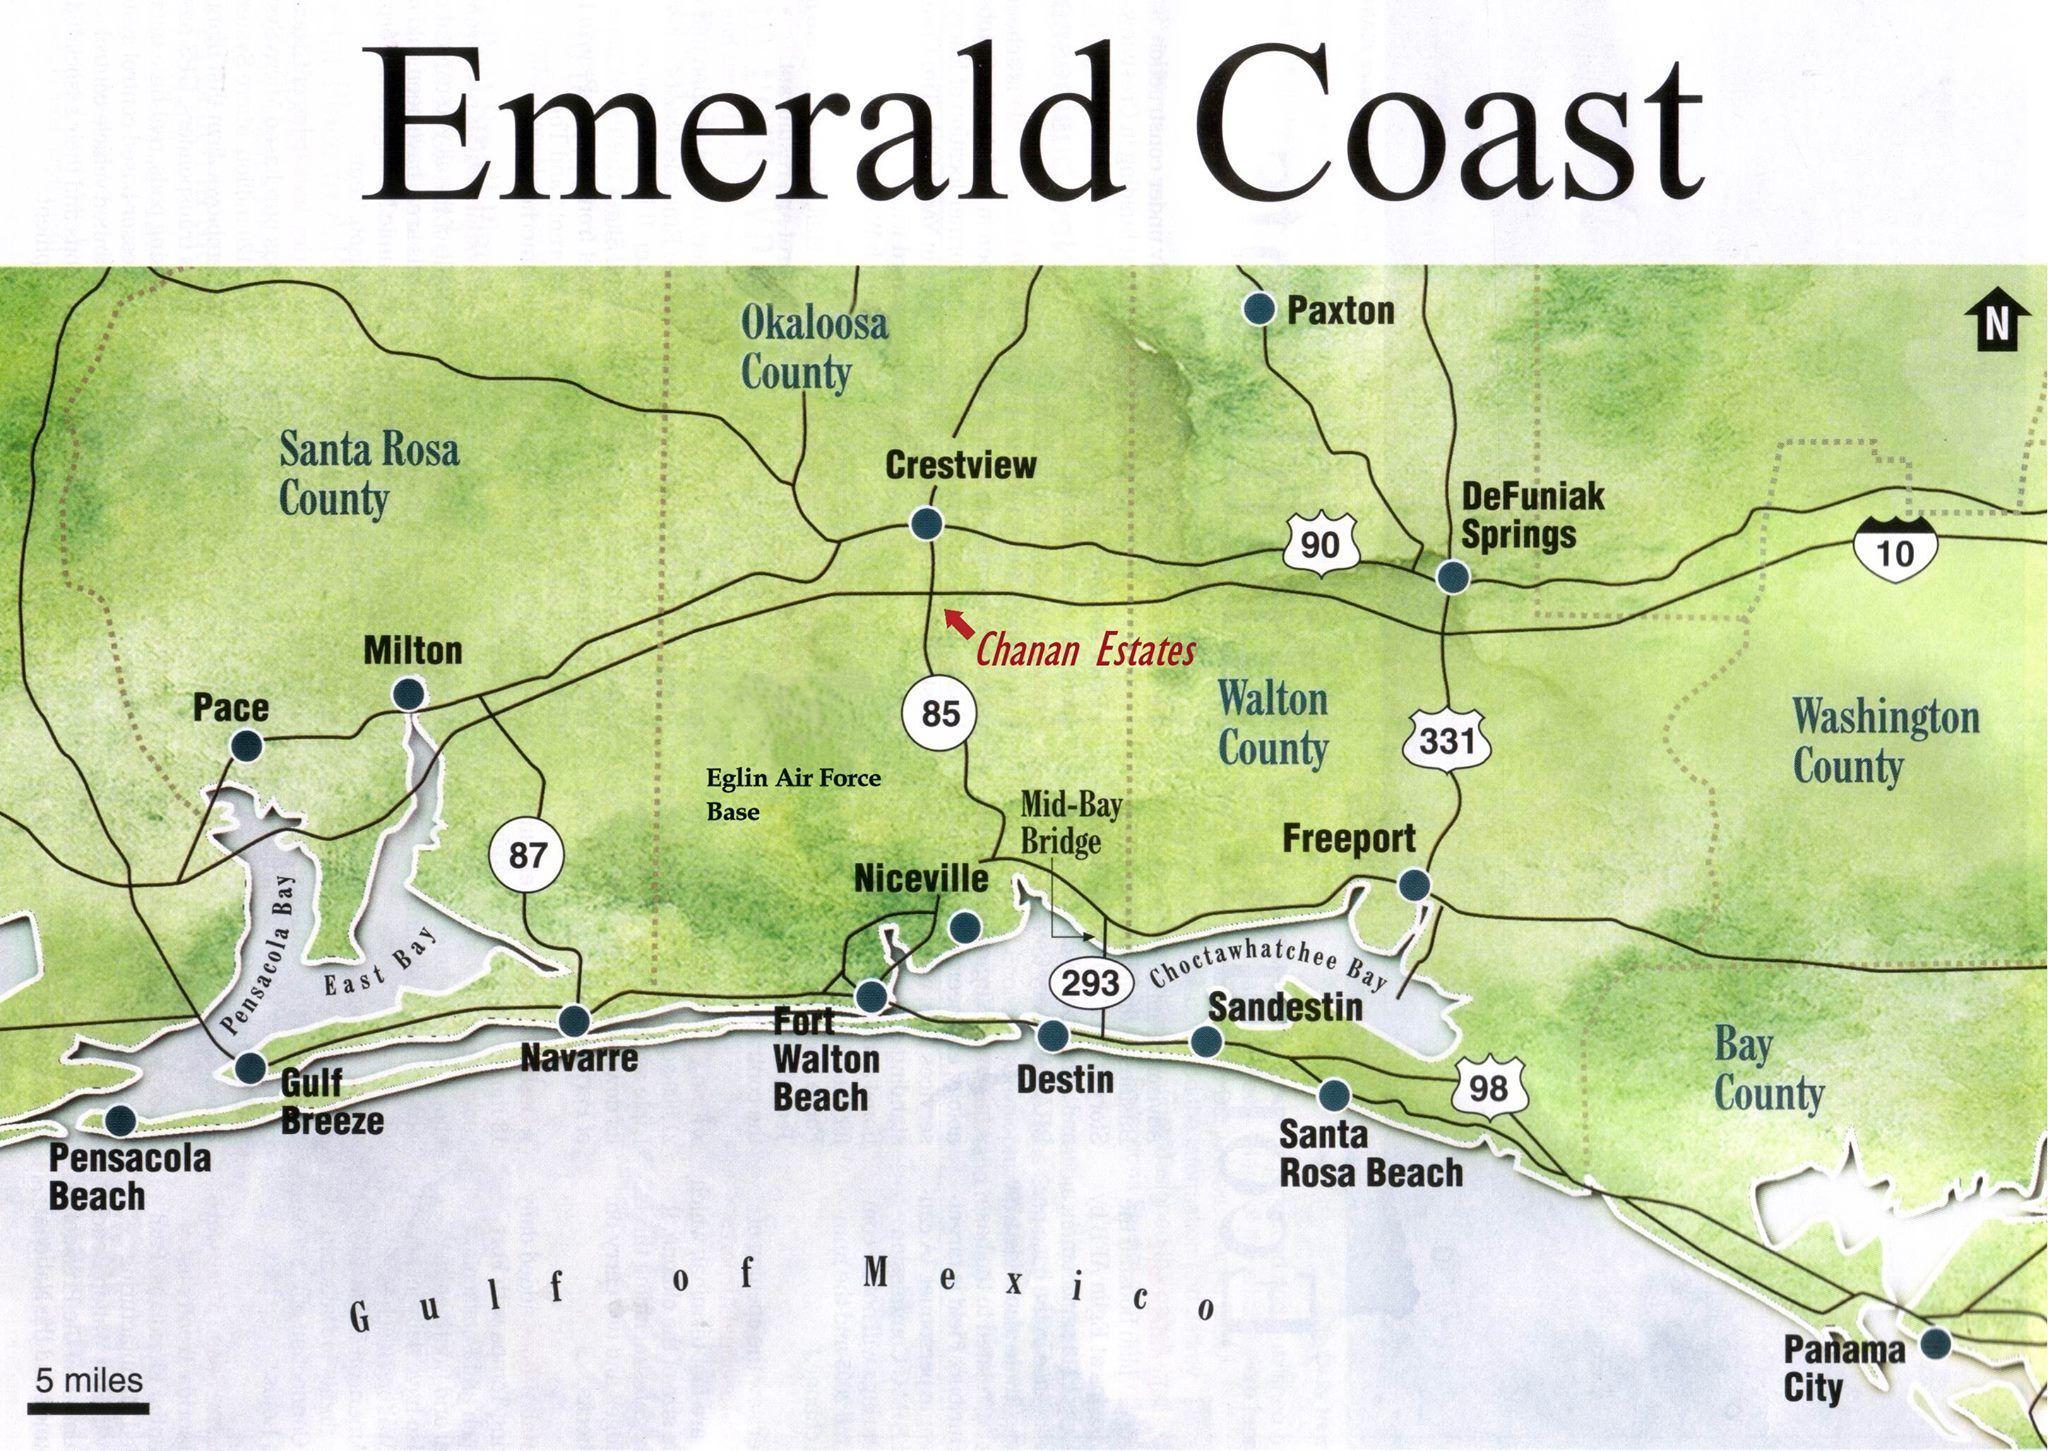 The Emerald Coast Network